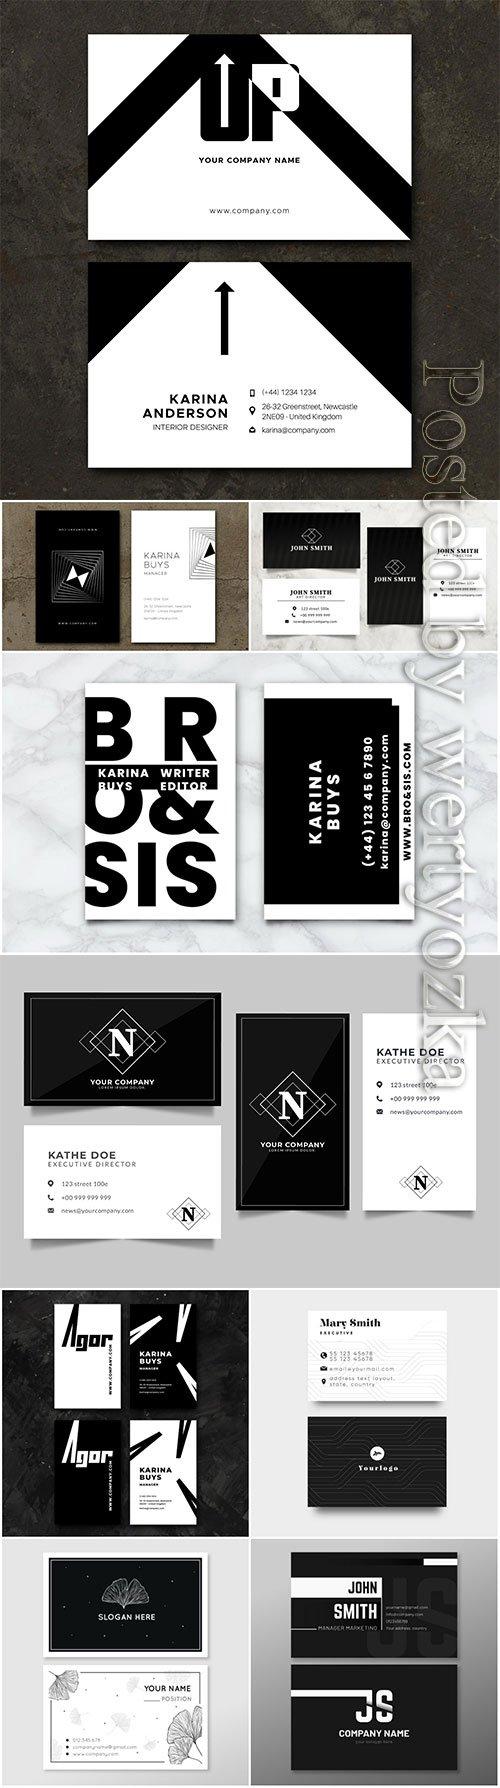 Monochrome business vector cards concept